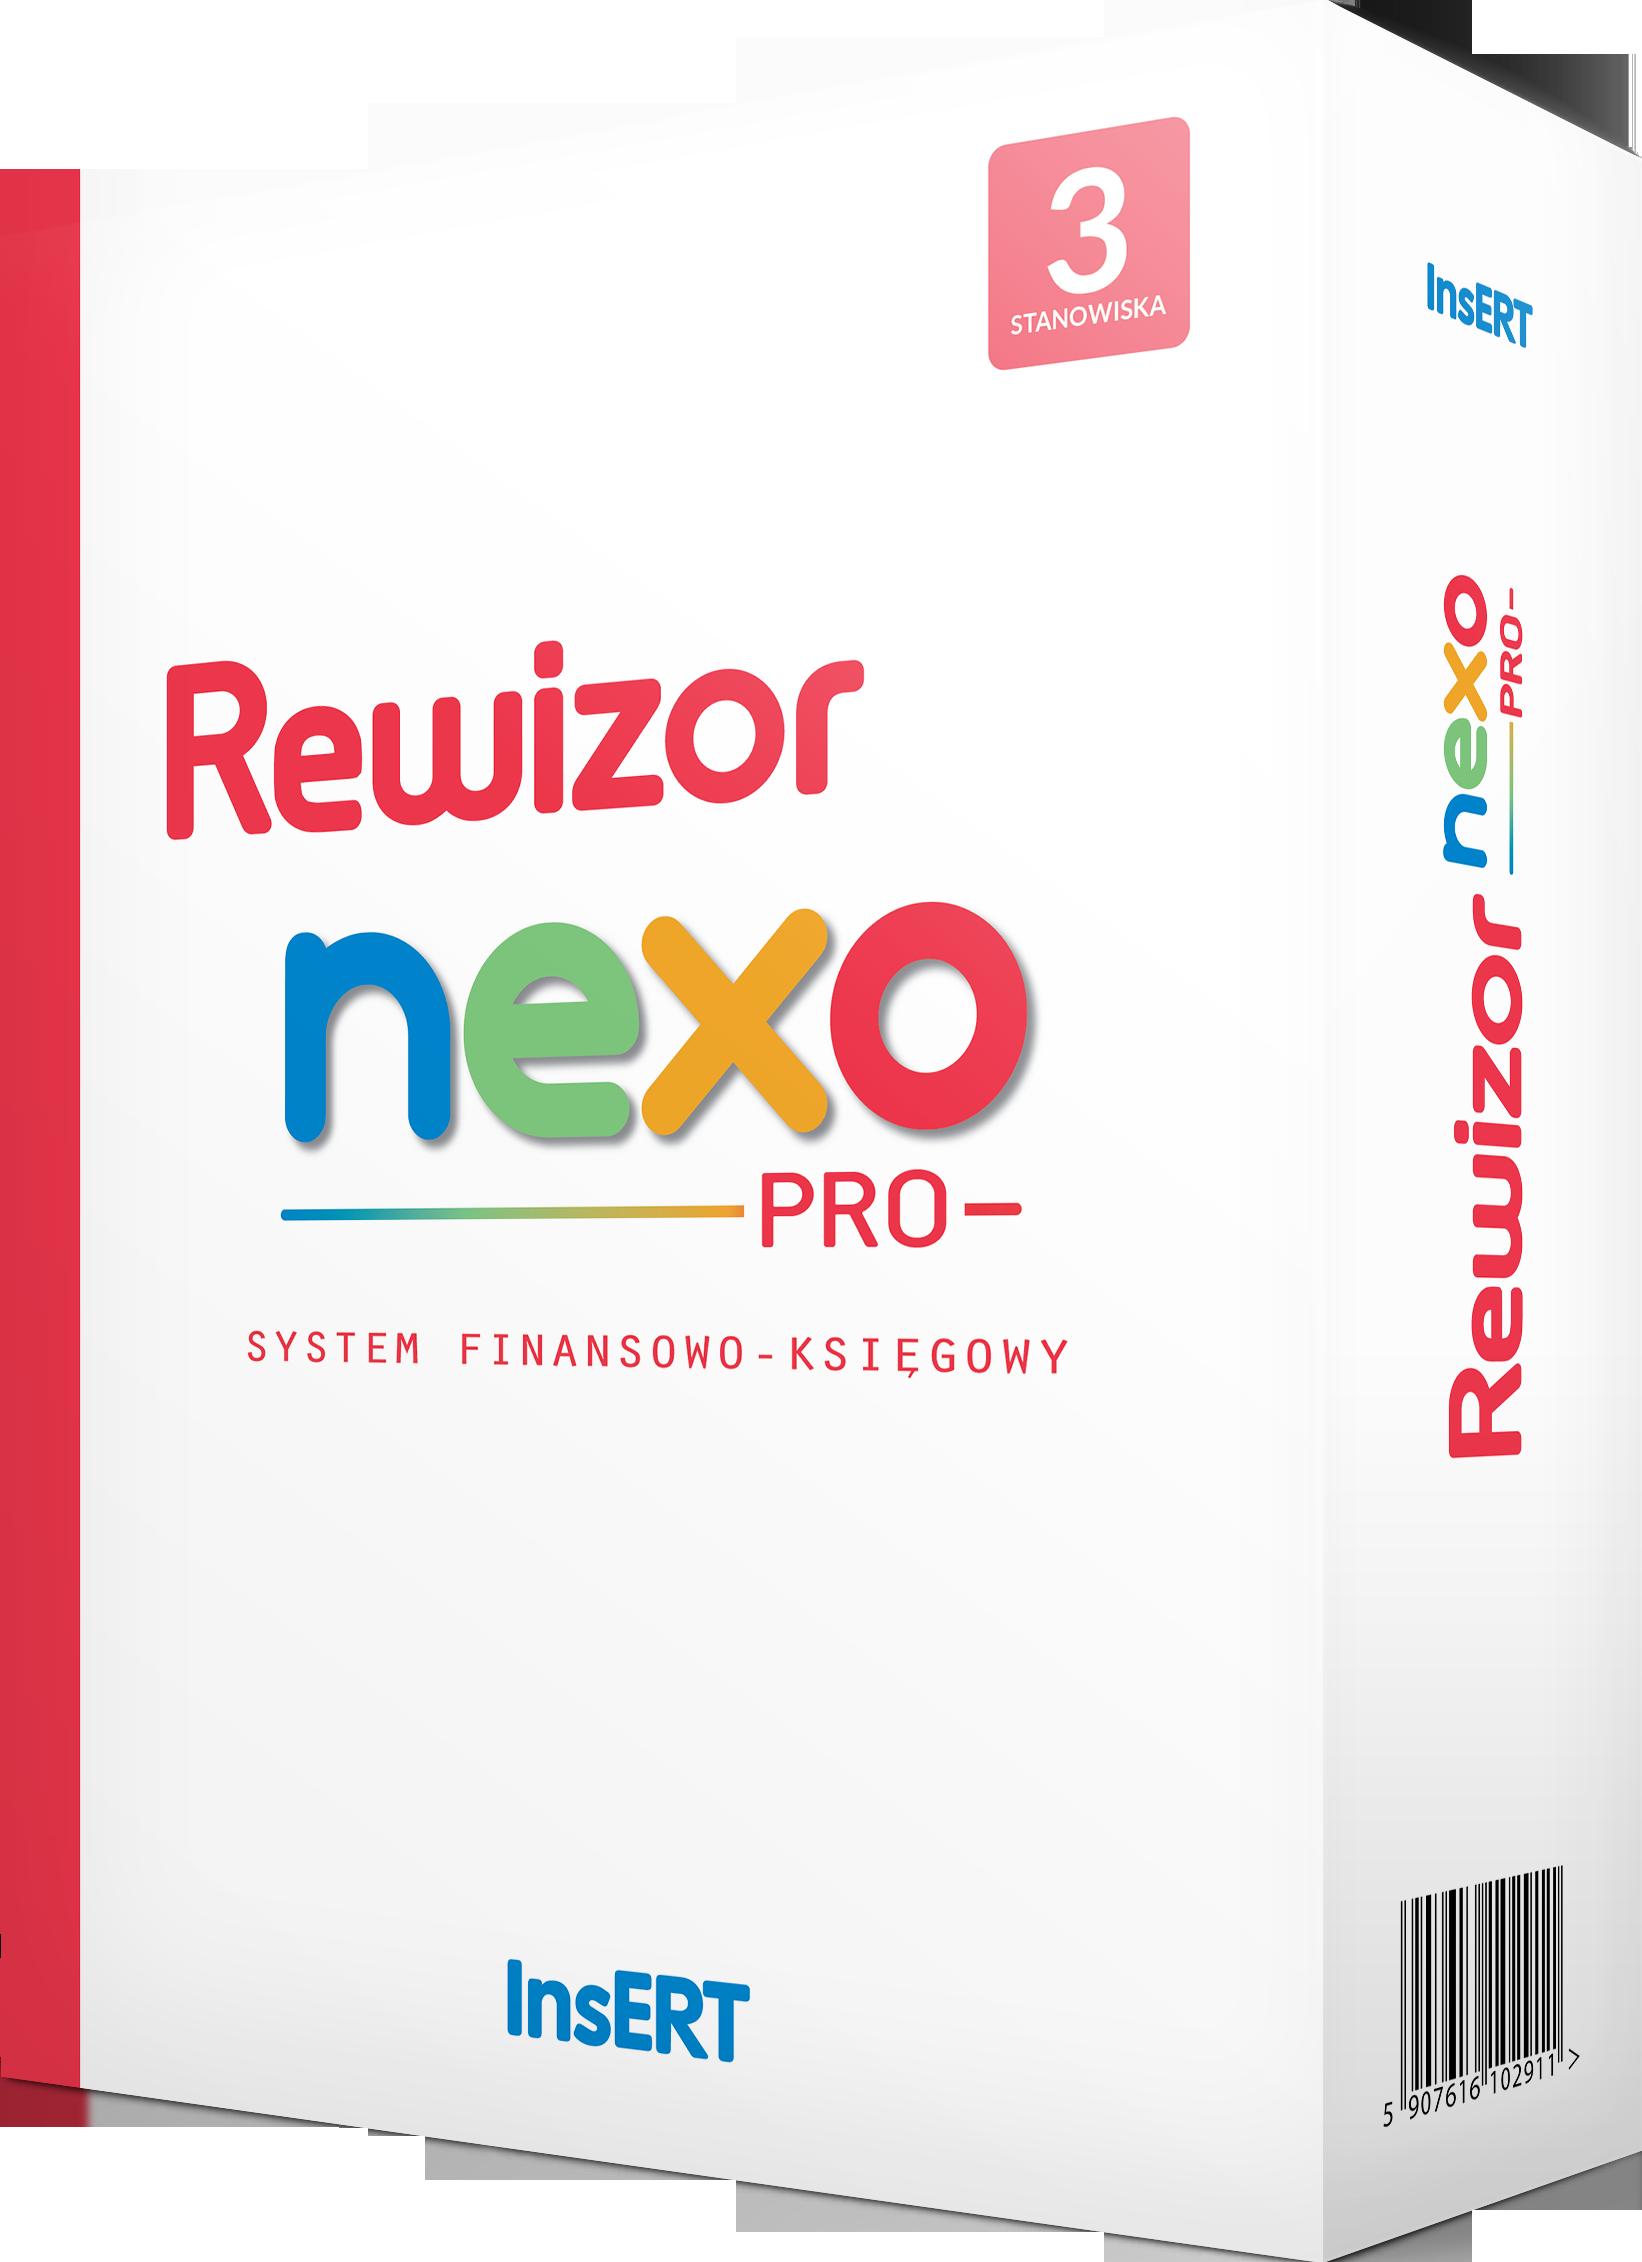 Rewizor_nexo_PRO_3_stanowiska_pudelko